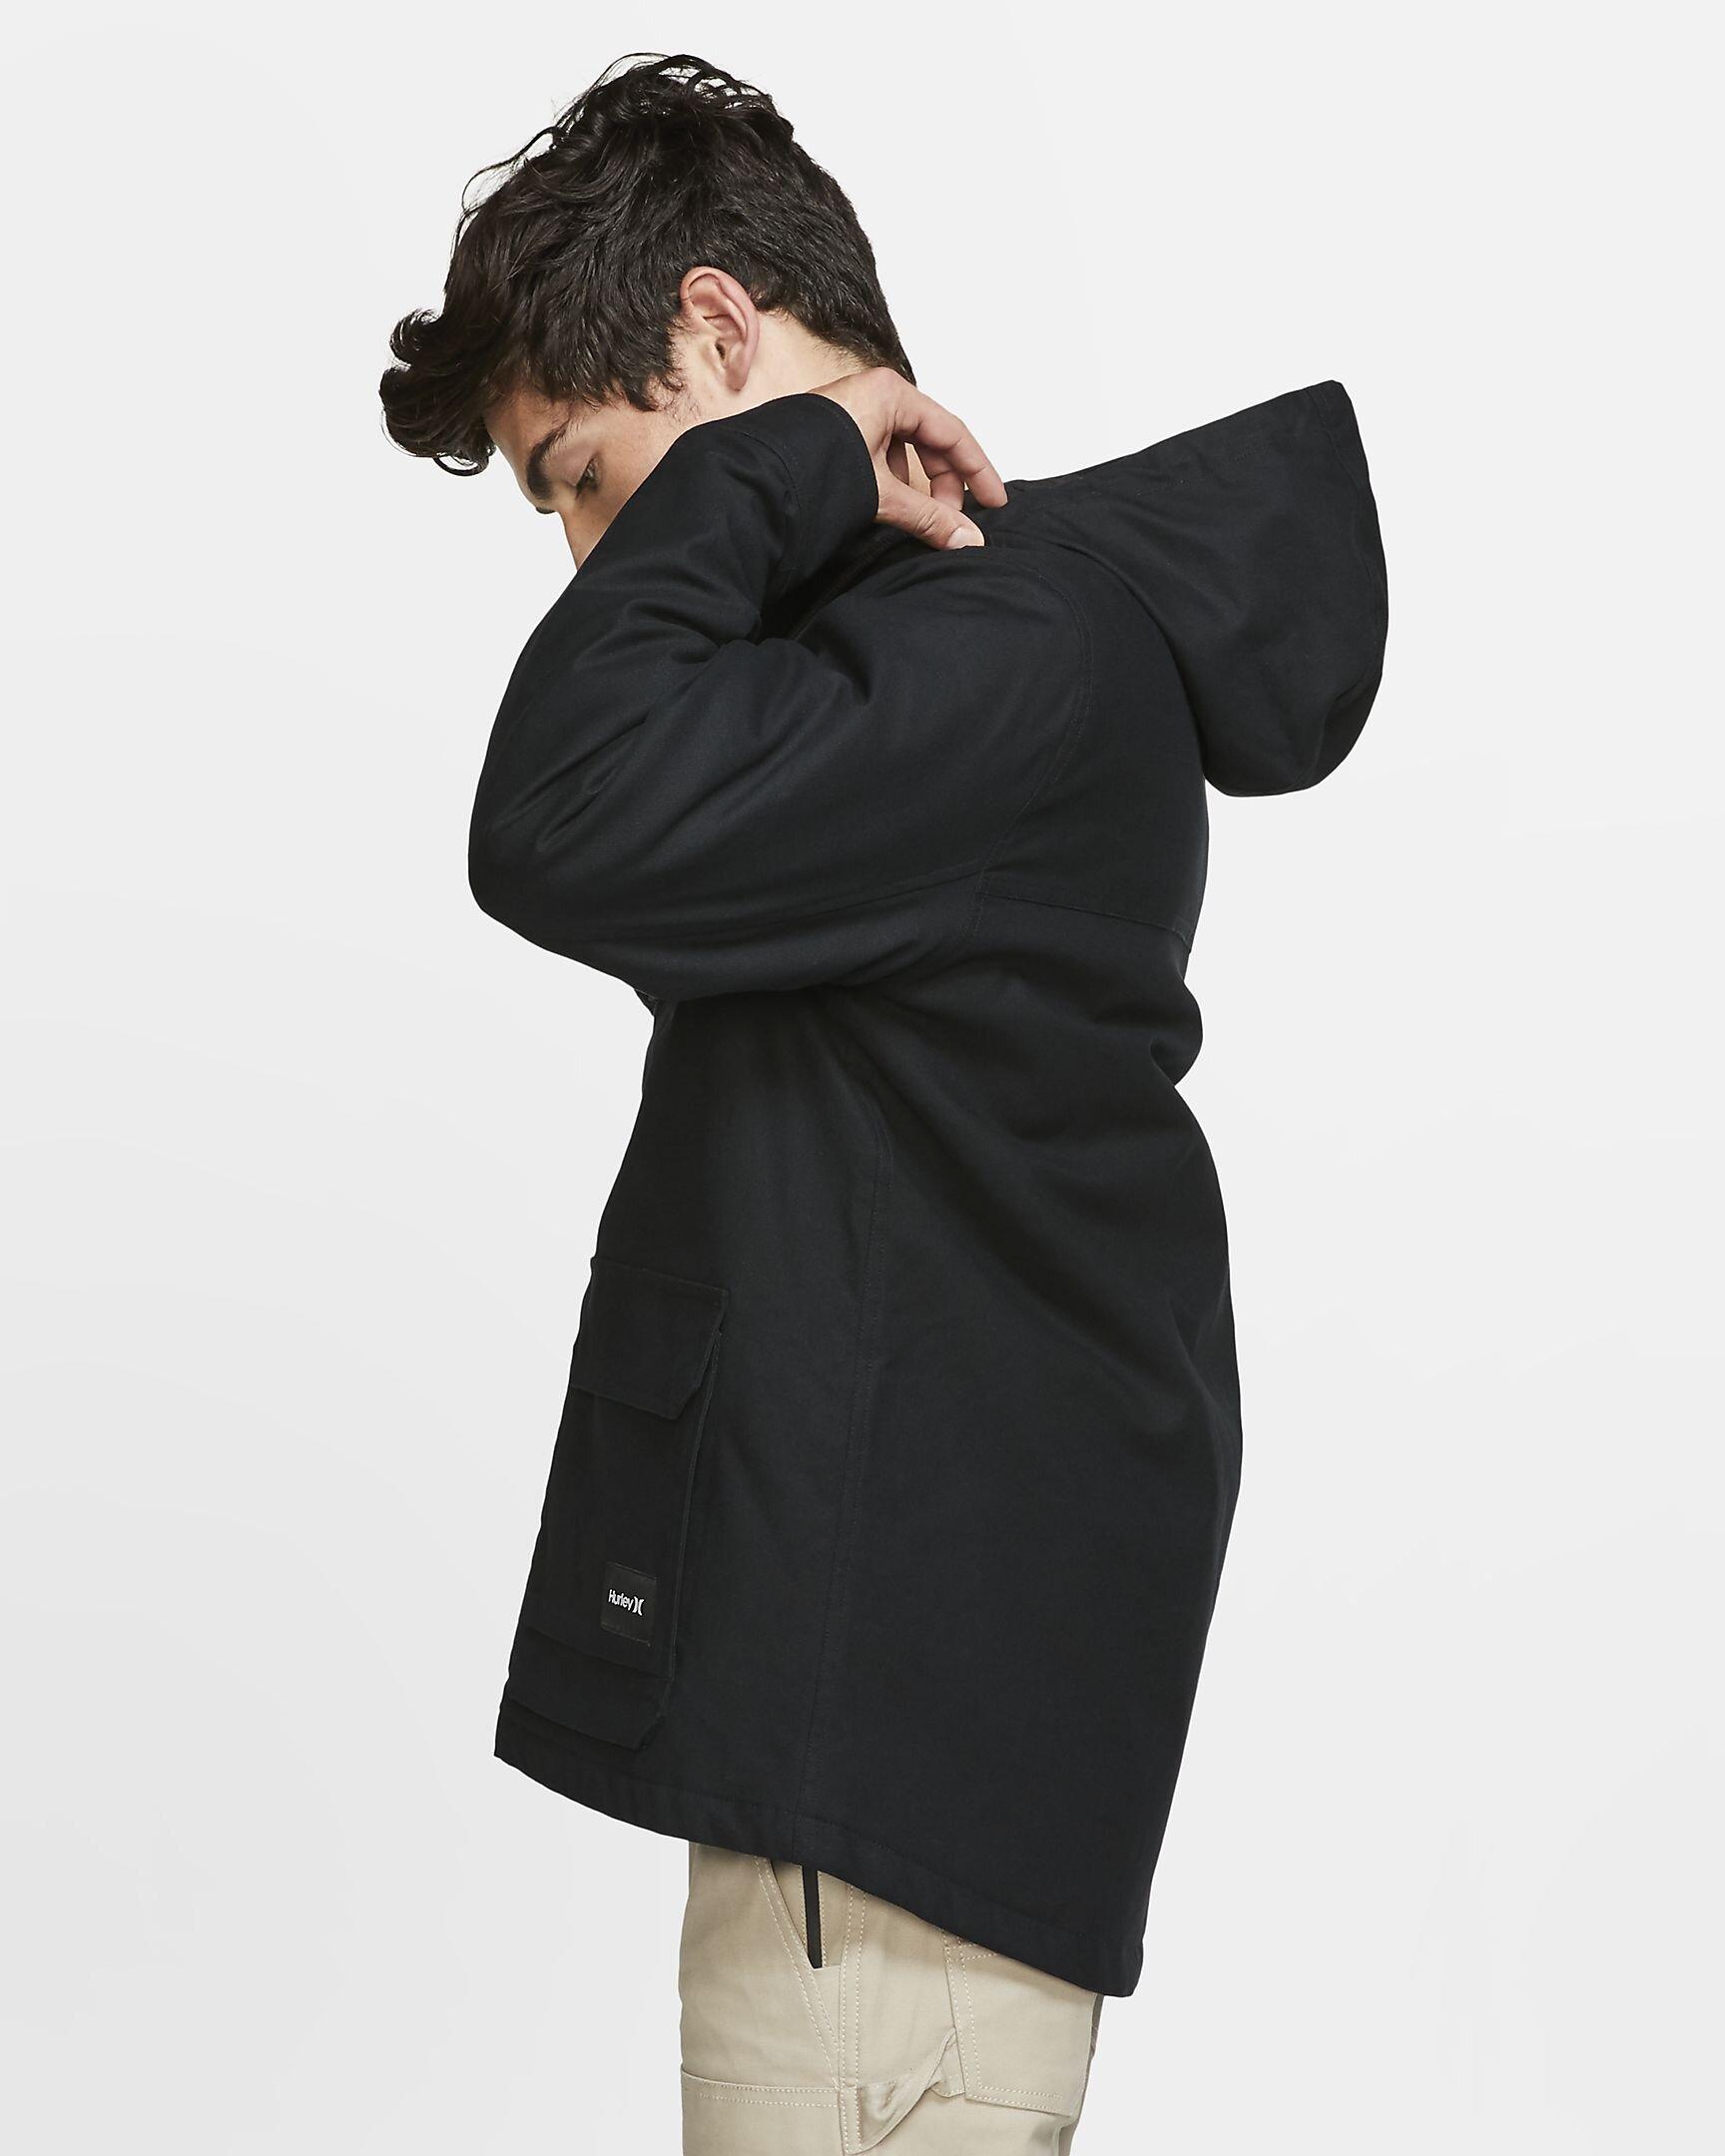 hurley-m65-mens-jacket-3229Xq-2.jpg